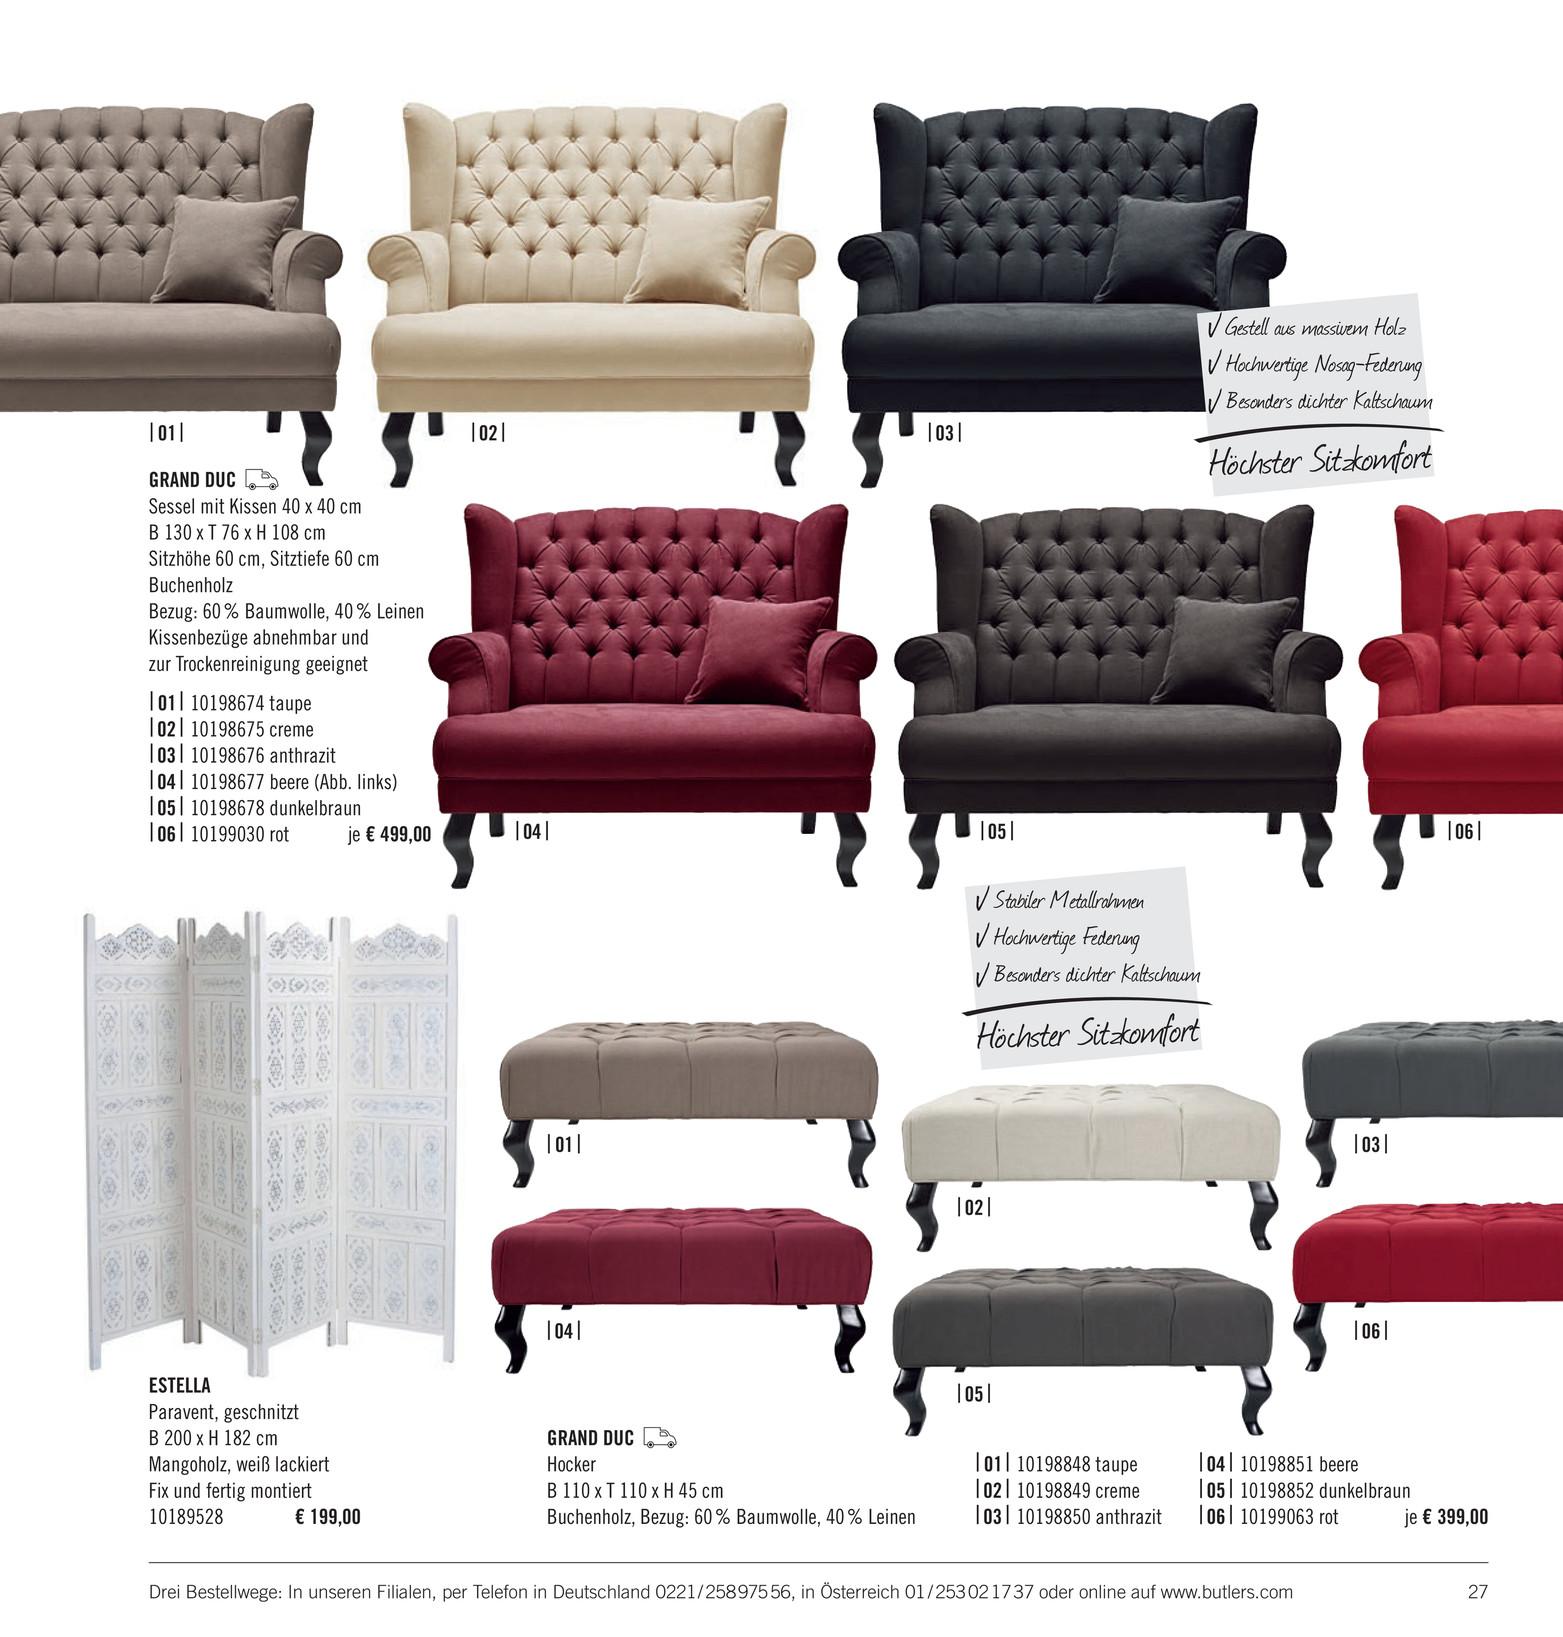 Butlers Katalog De Wohnst Cke Katalog 2014 Seite 26 27